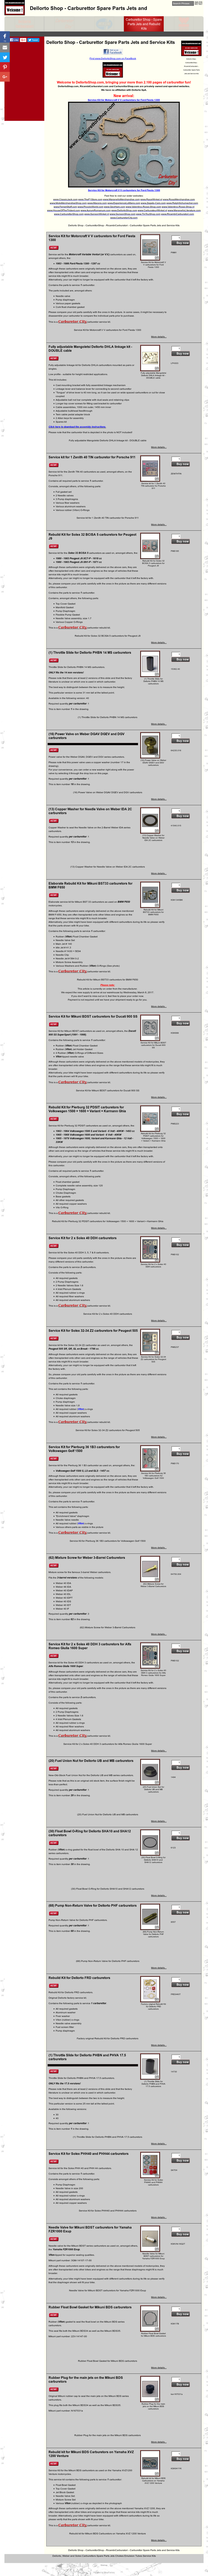 Dellortoshop Competitors, Revenue and Employees - Owler